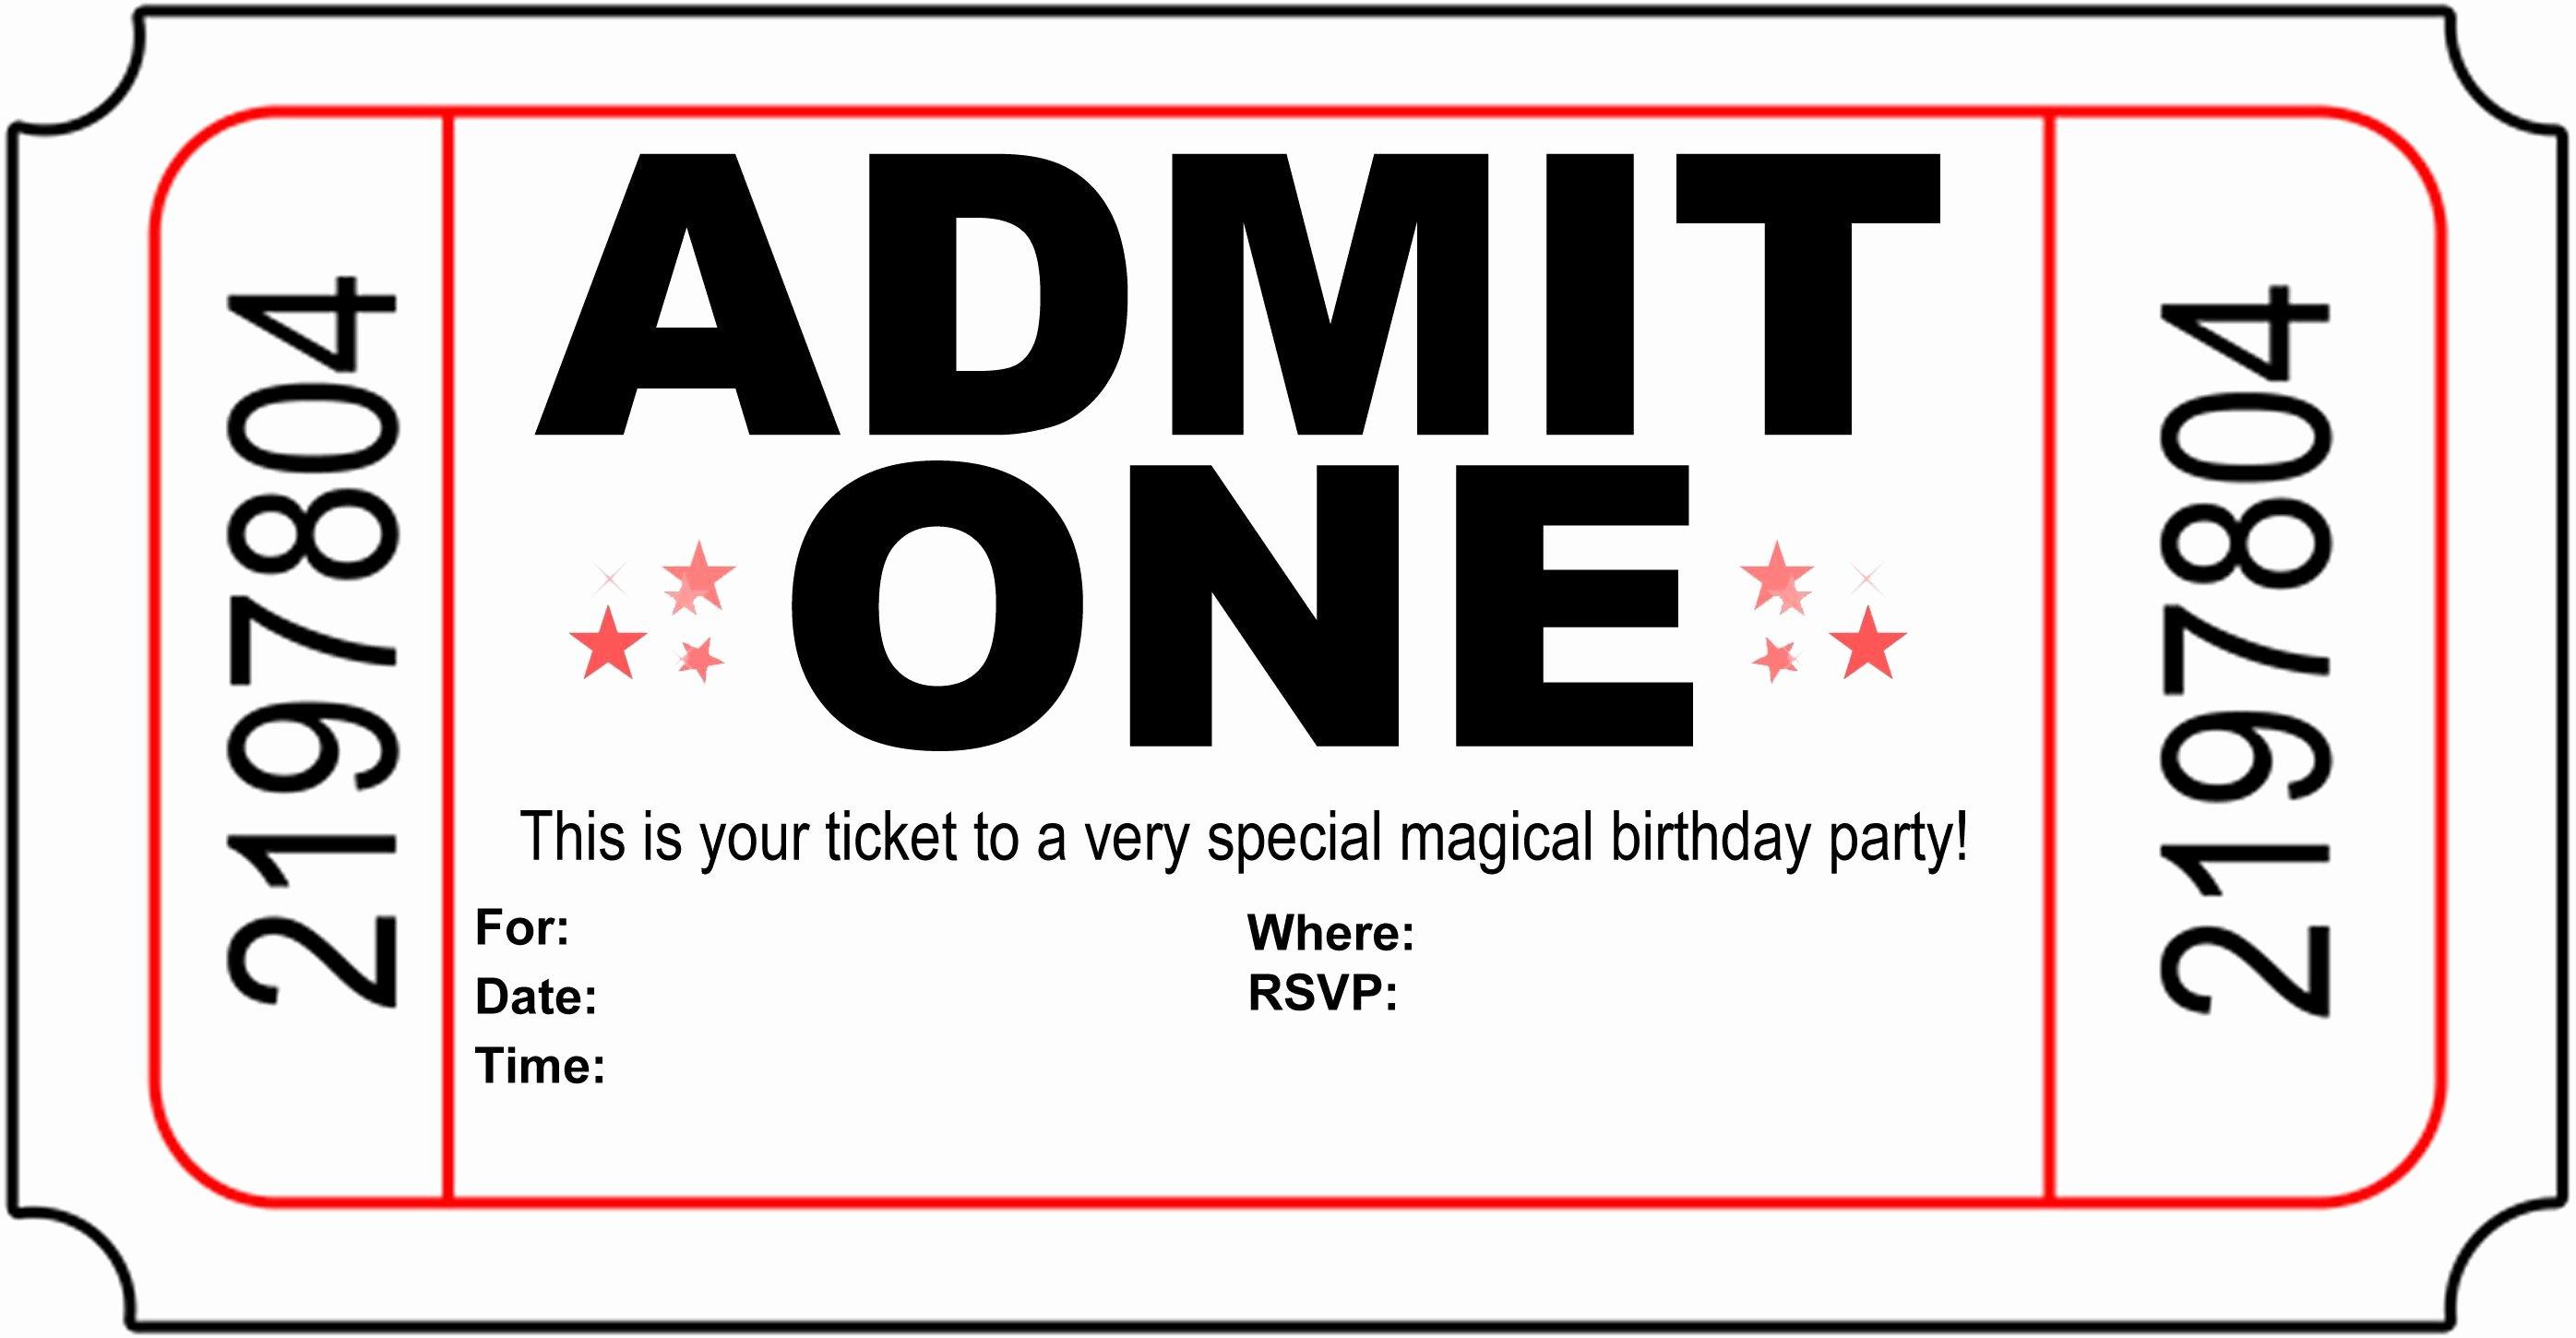 Movie Ticket Invitation Template Awesome Polar Express Invitation Template Free